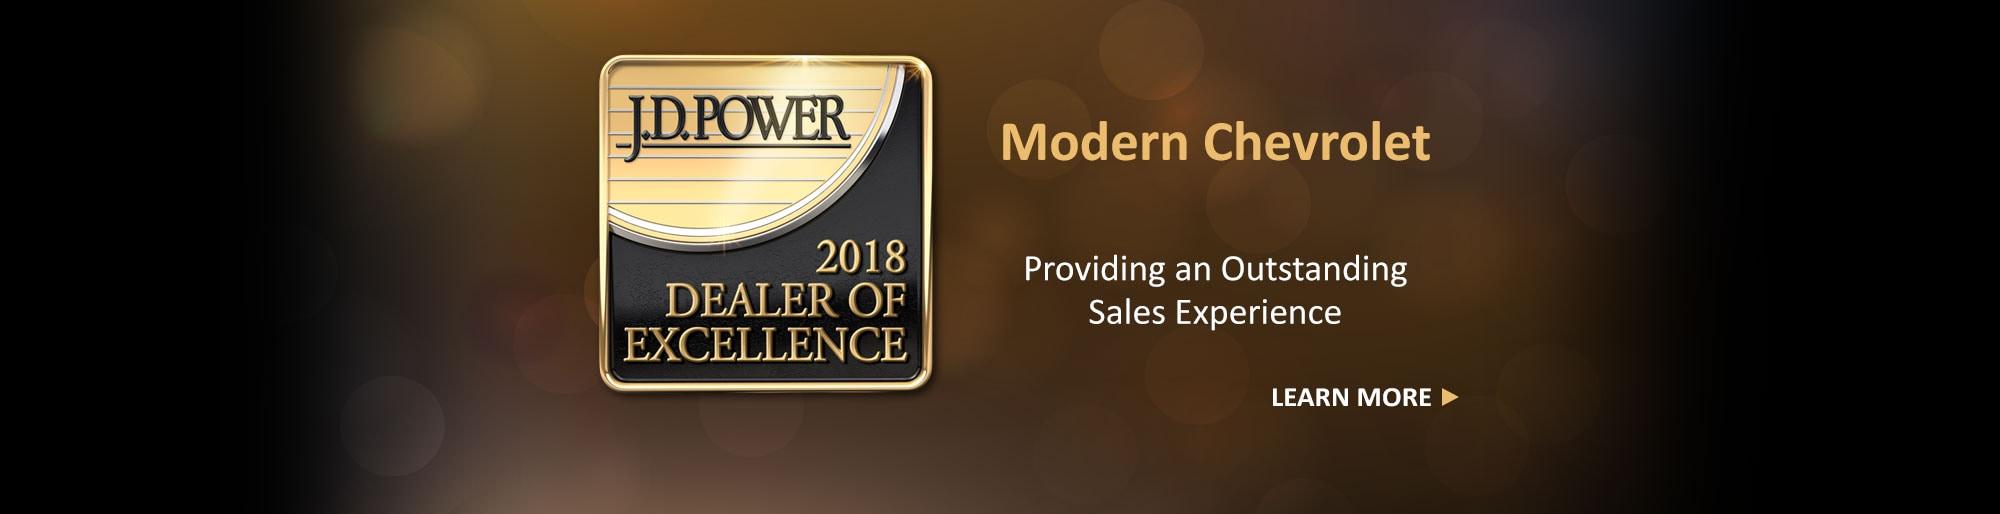 Modern Chevrolet Chevy Dealership In Winston Salem Nc Fuel Filter Housing Duramax Van Previous Next